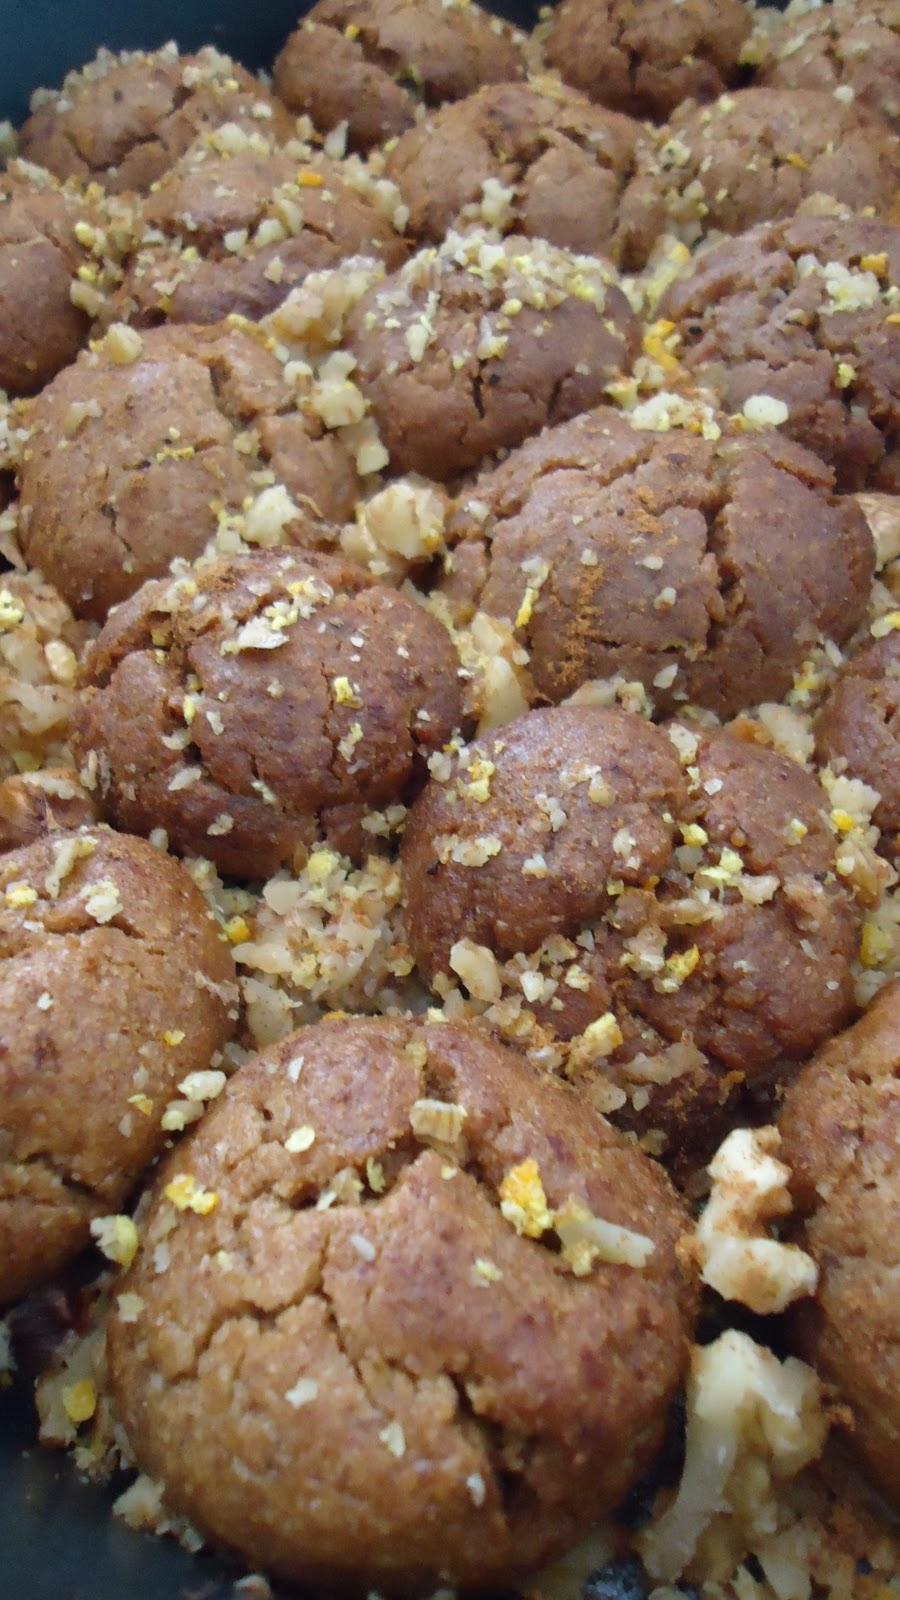 The Greek Bite Healthy Melomakarona Cookies Vegan Gluten Free And